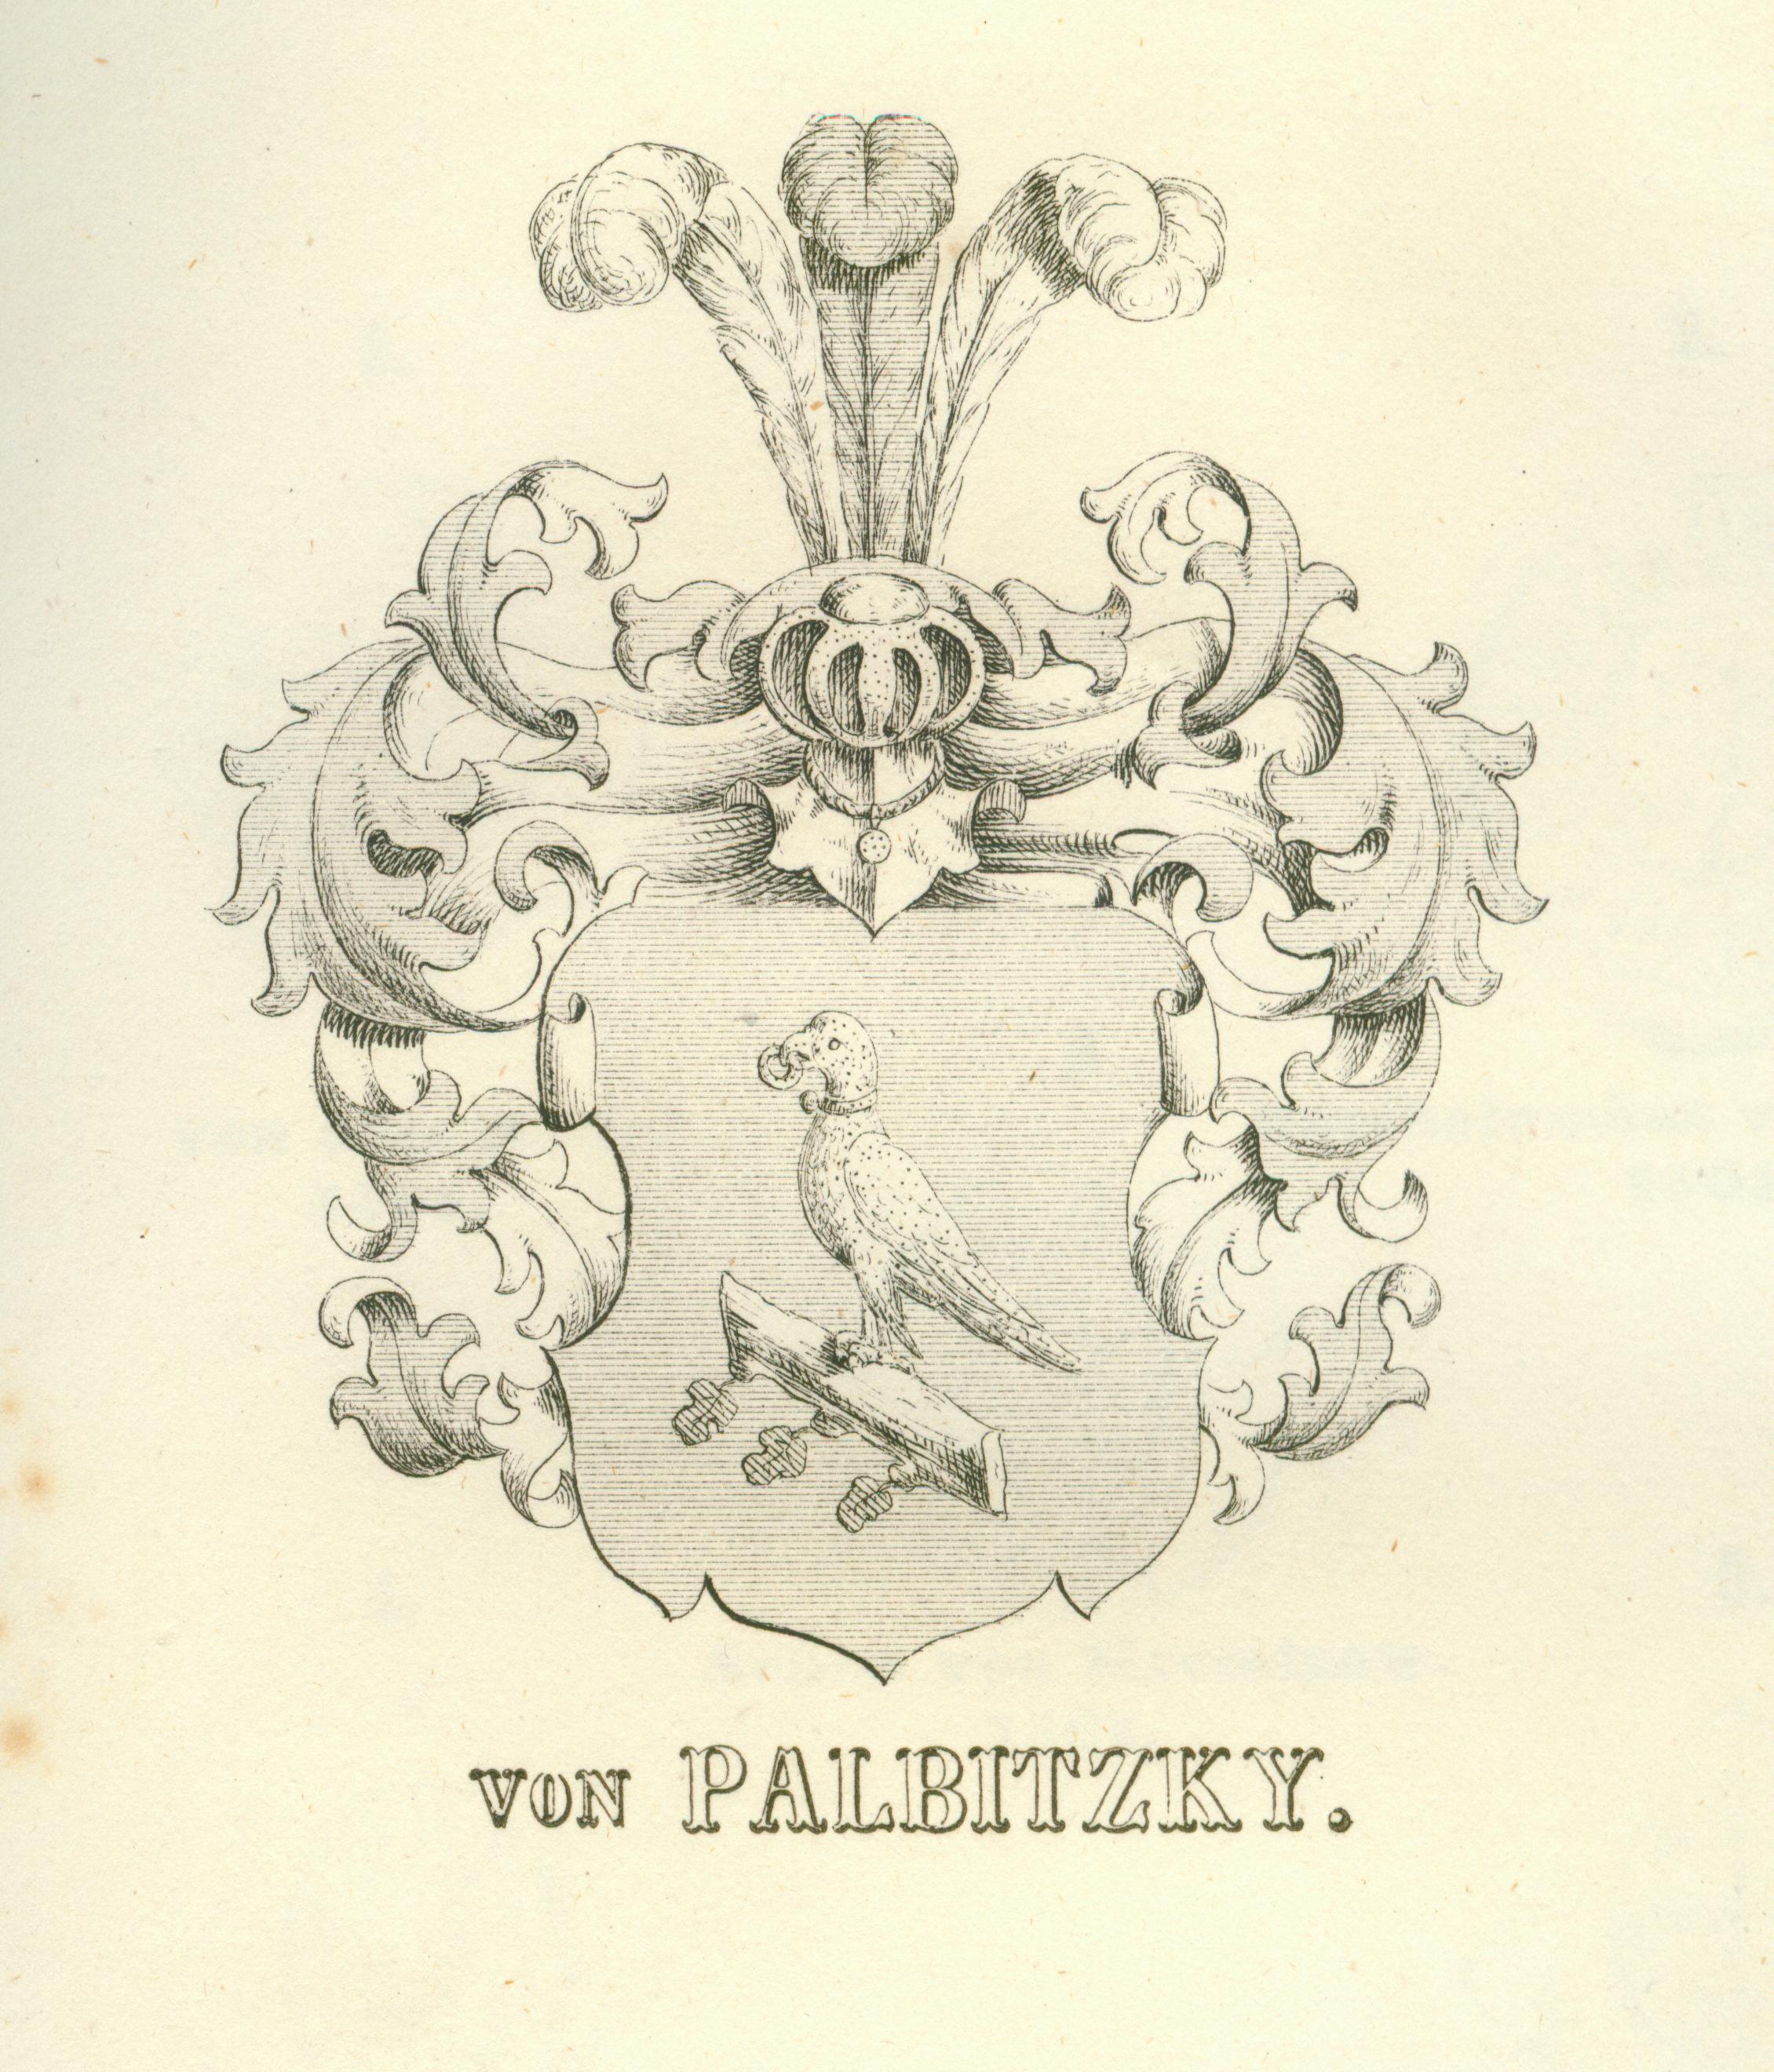 Palbitzky